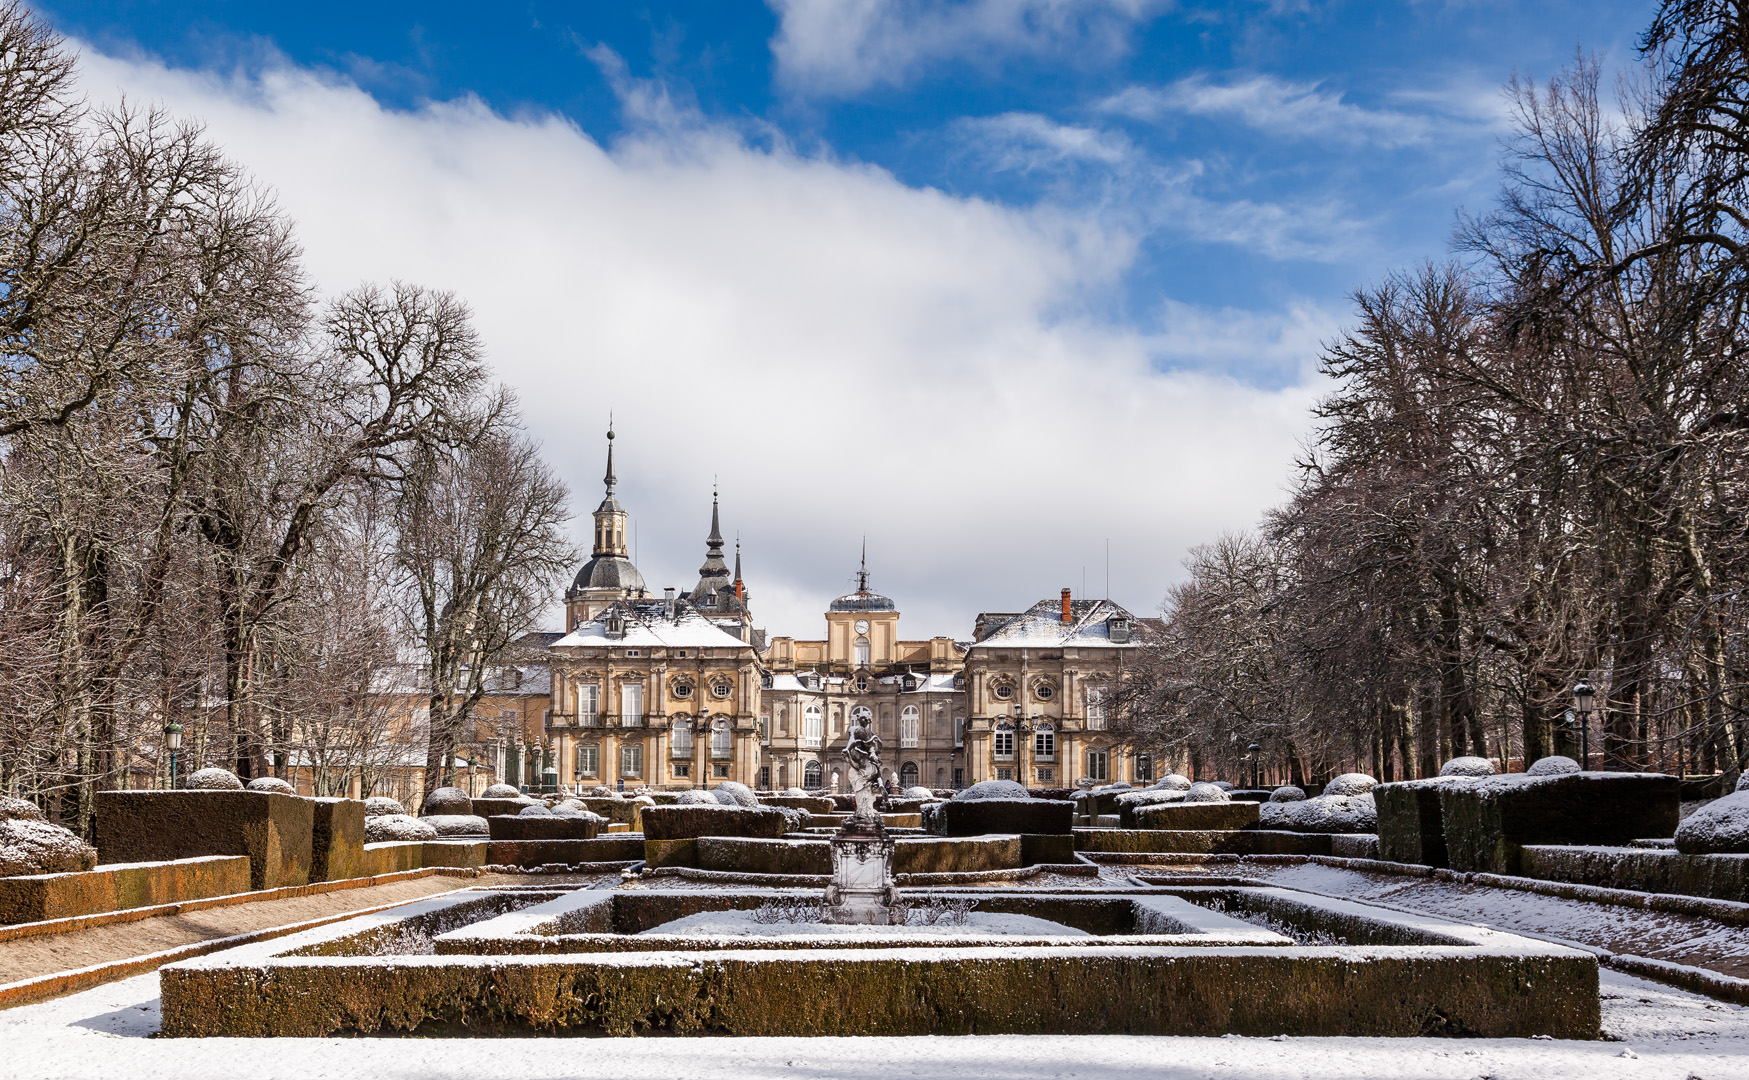 palacio-real-granja-san-ildefonso-5